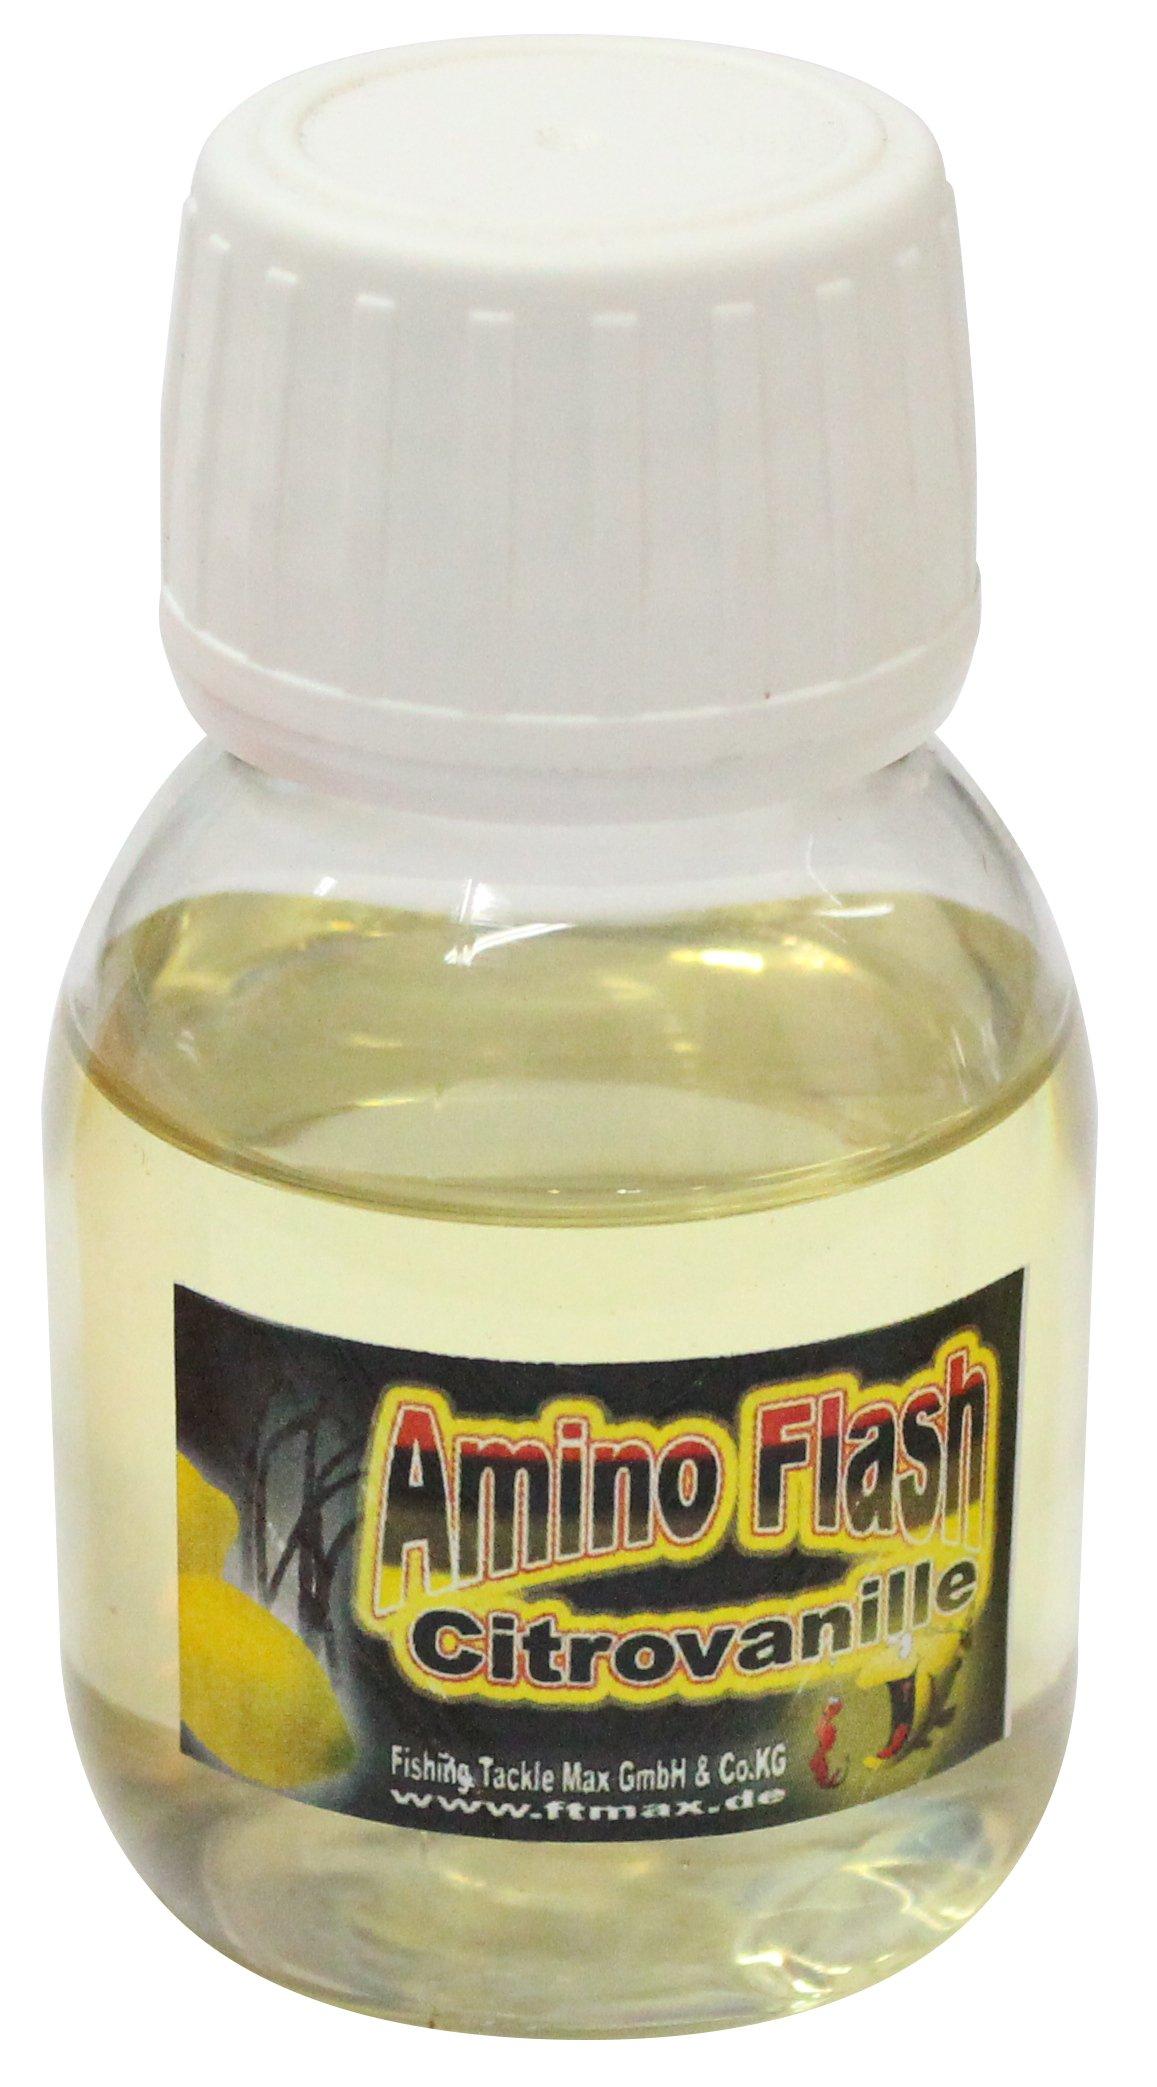 FTM Amino Flash Aroma 750g verschiedene Sorten Fishing Tackle Max Aromen